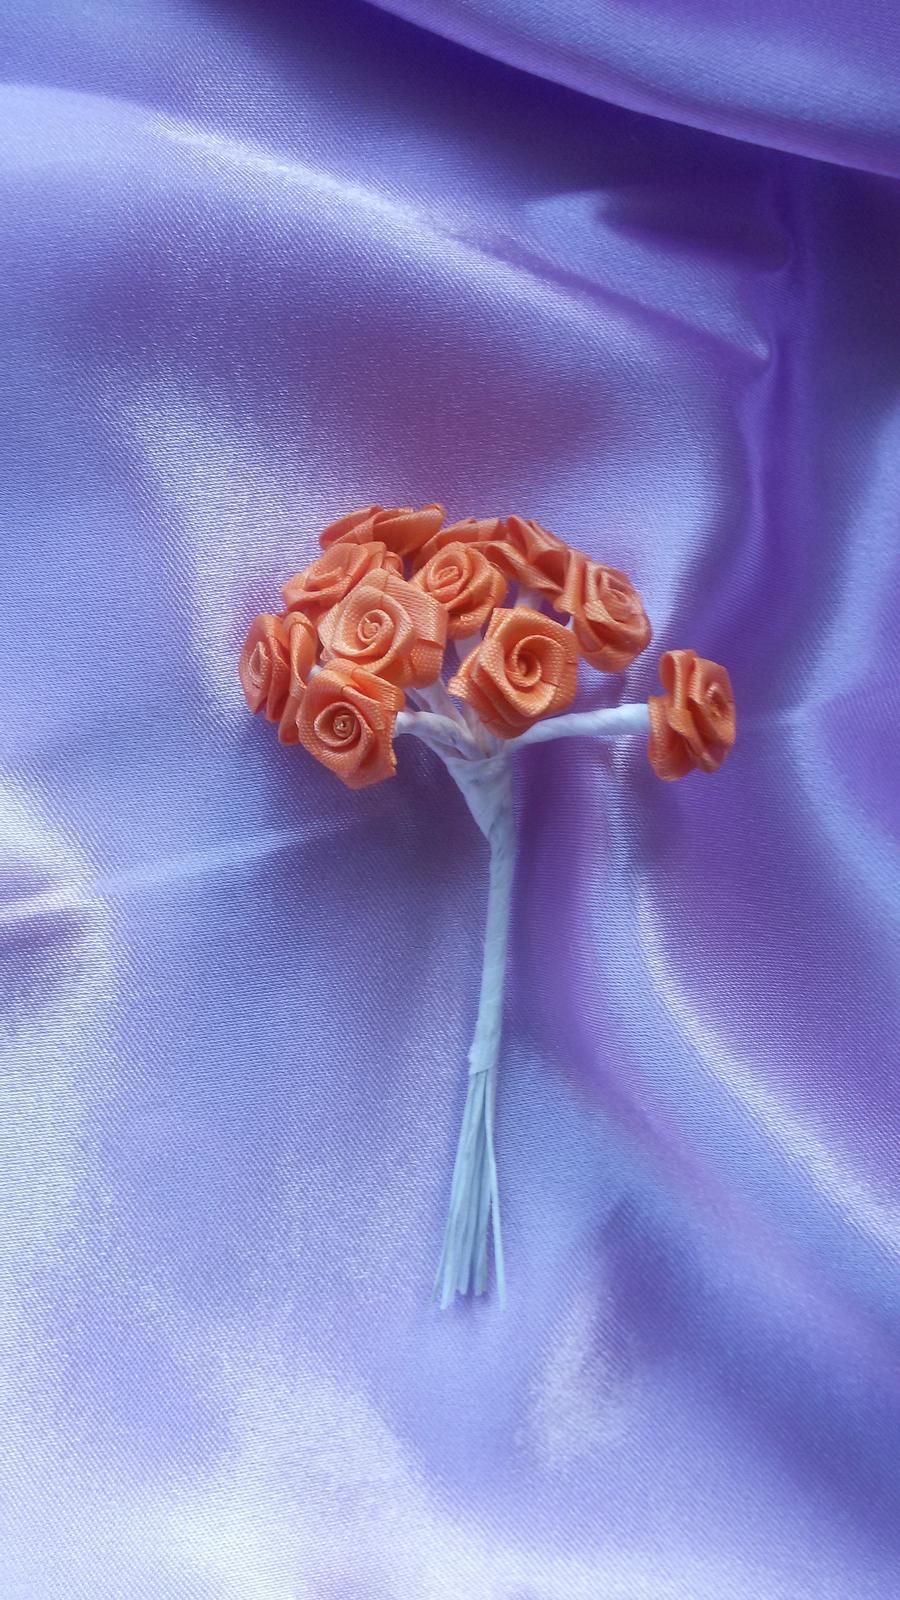 Svazek malých saténových růžiček - Obrázek č. 1